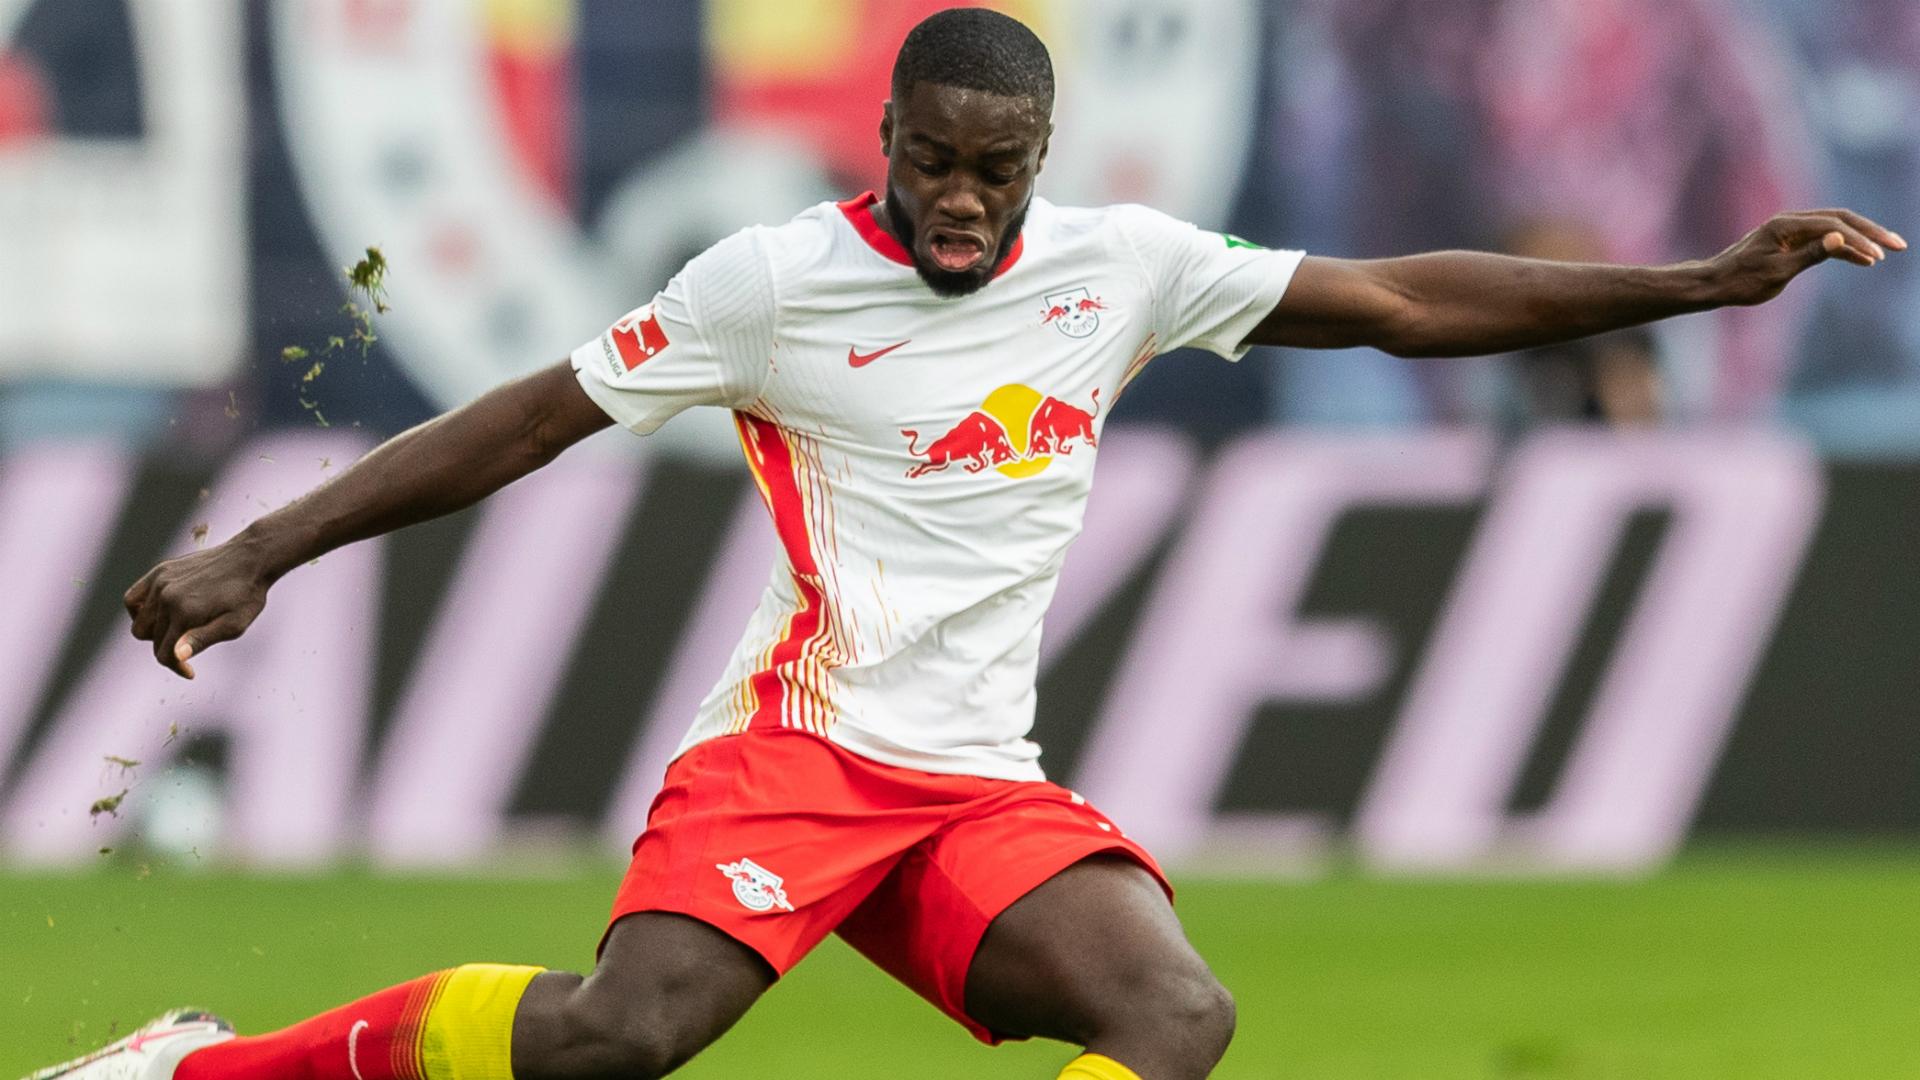 Rumour Has It: Man Utd to make move for Leipzig's Upamecano